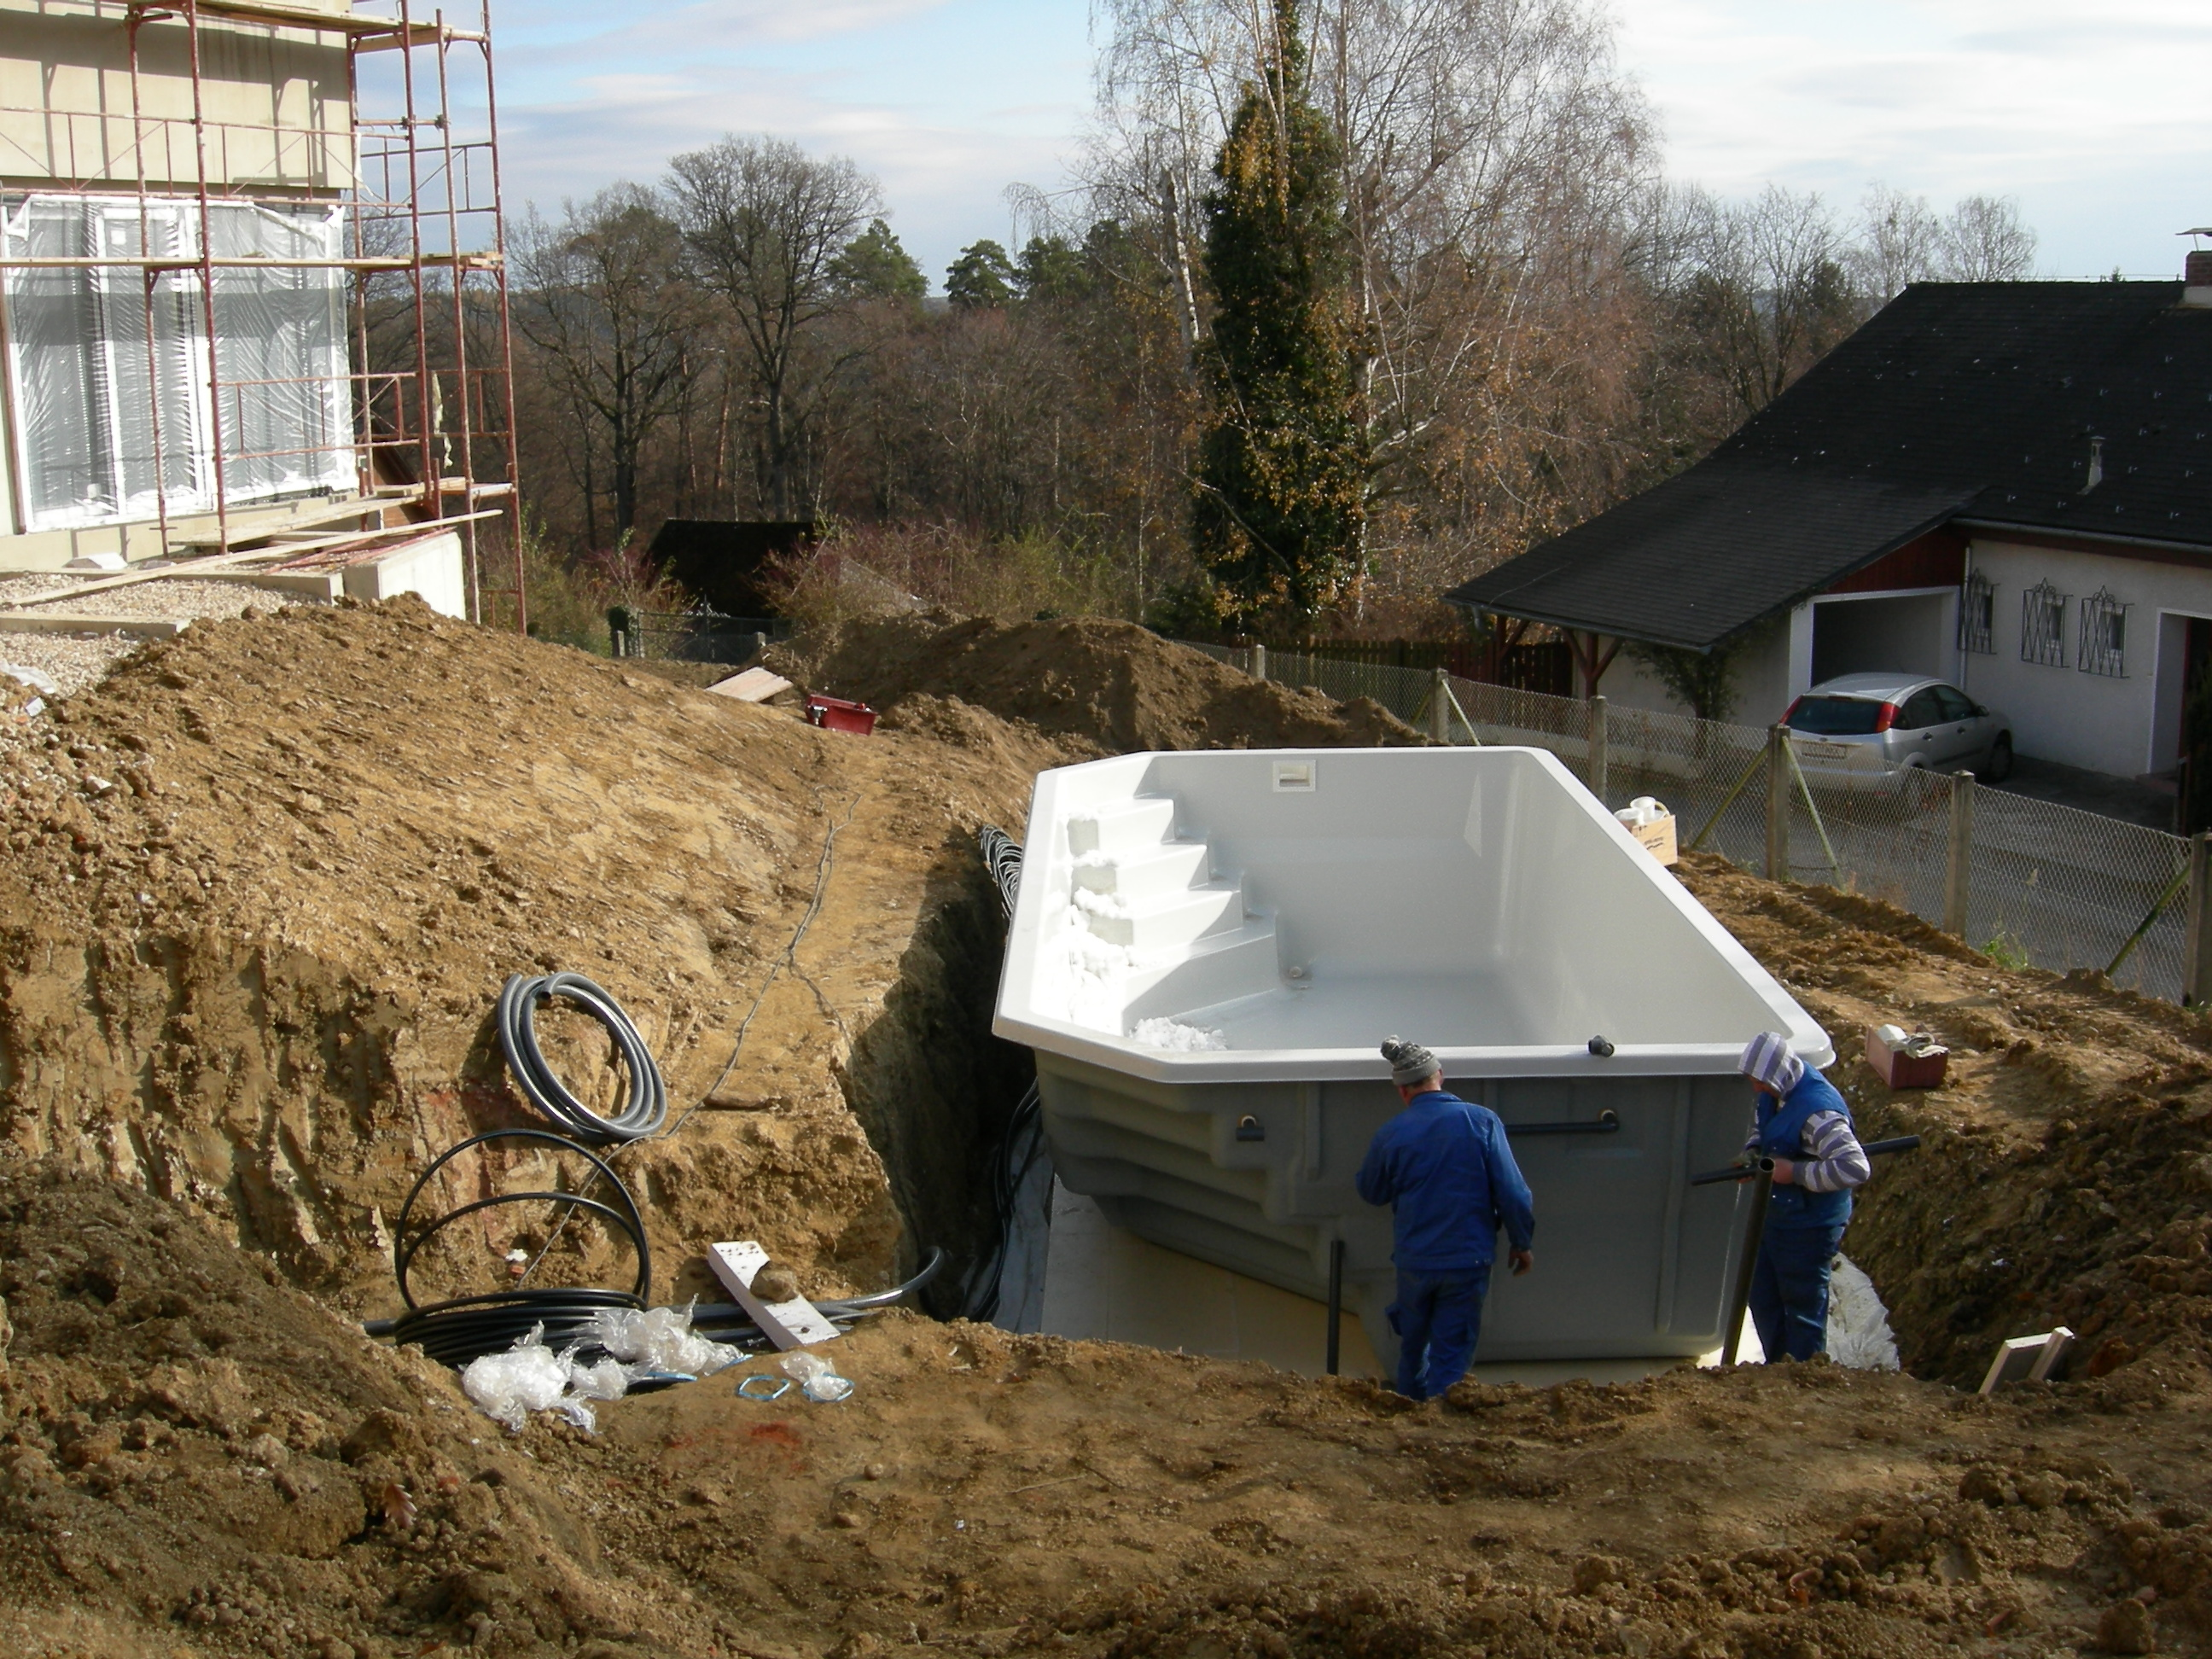 Pool inbetriebnahme ing klaus gretler for Schwimmbad becken